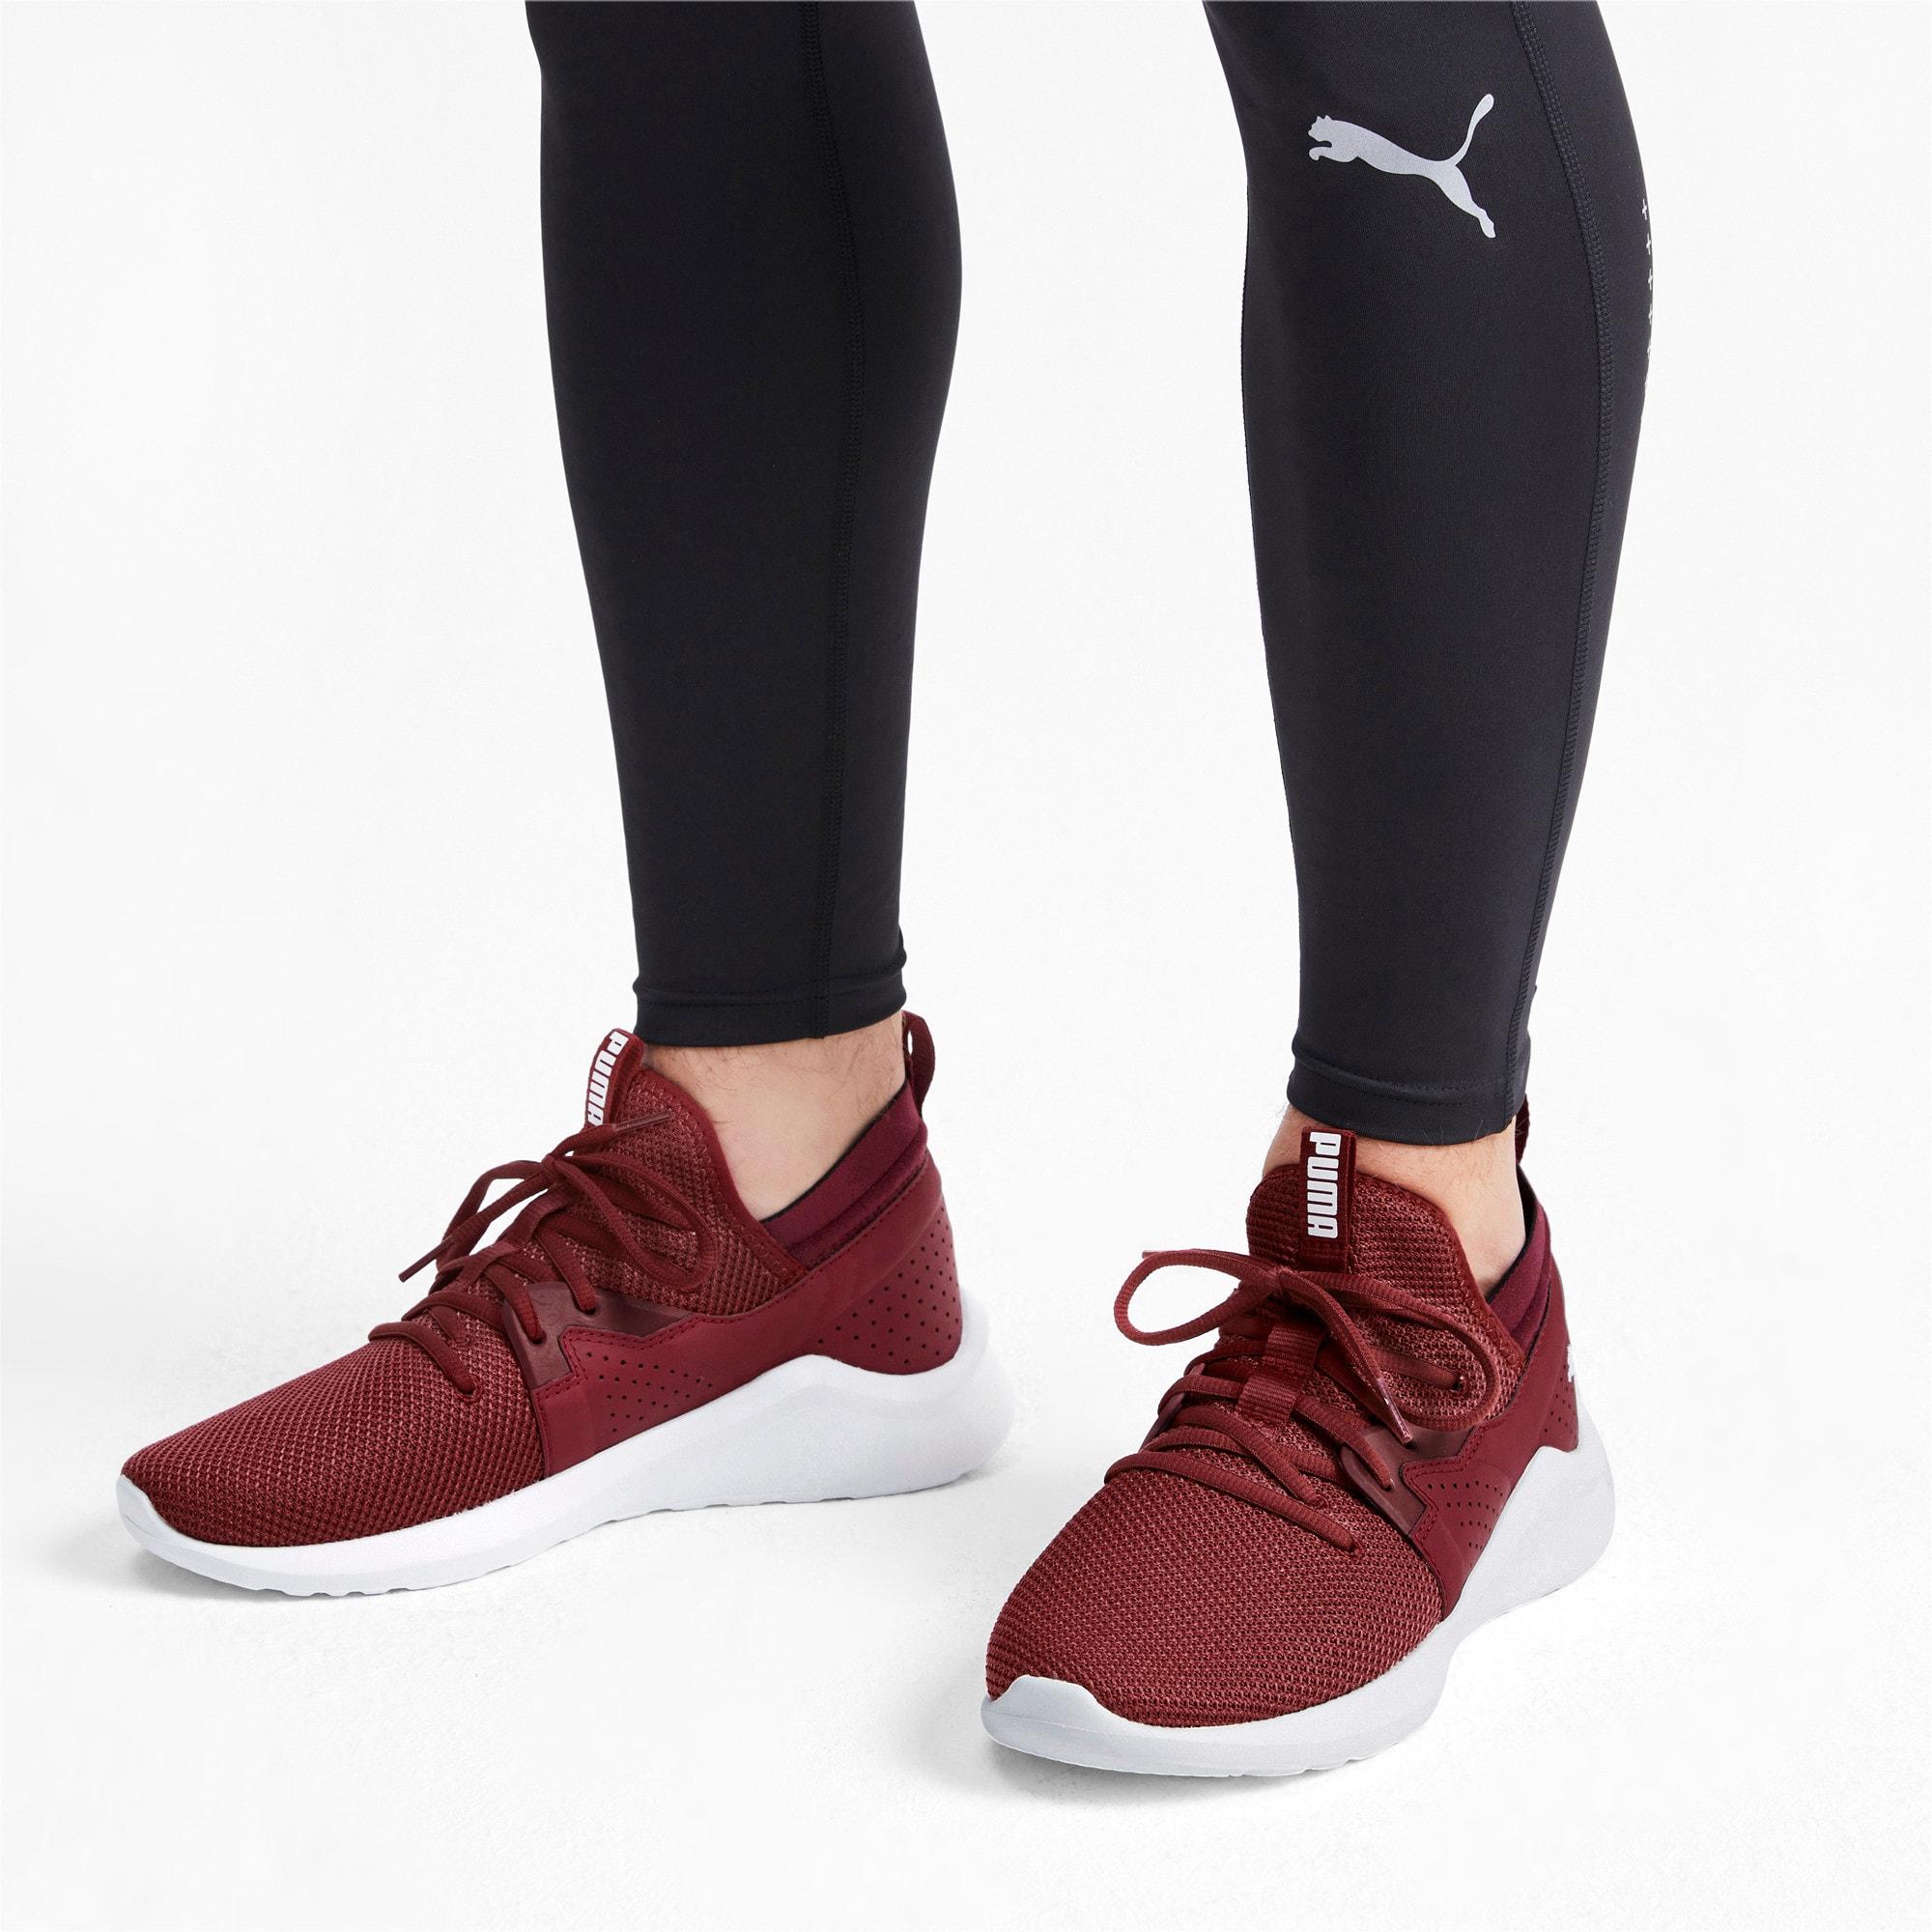 Thumbnail 2 of Emergence Men's Running Shoes, Rhubarb-Puma White, medium-IND